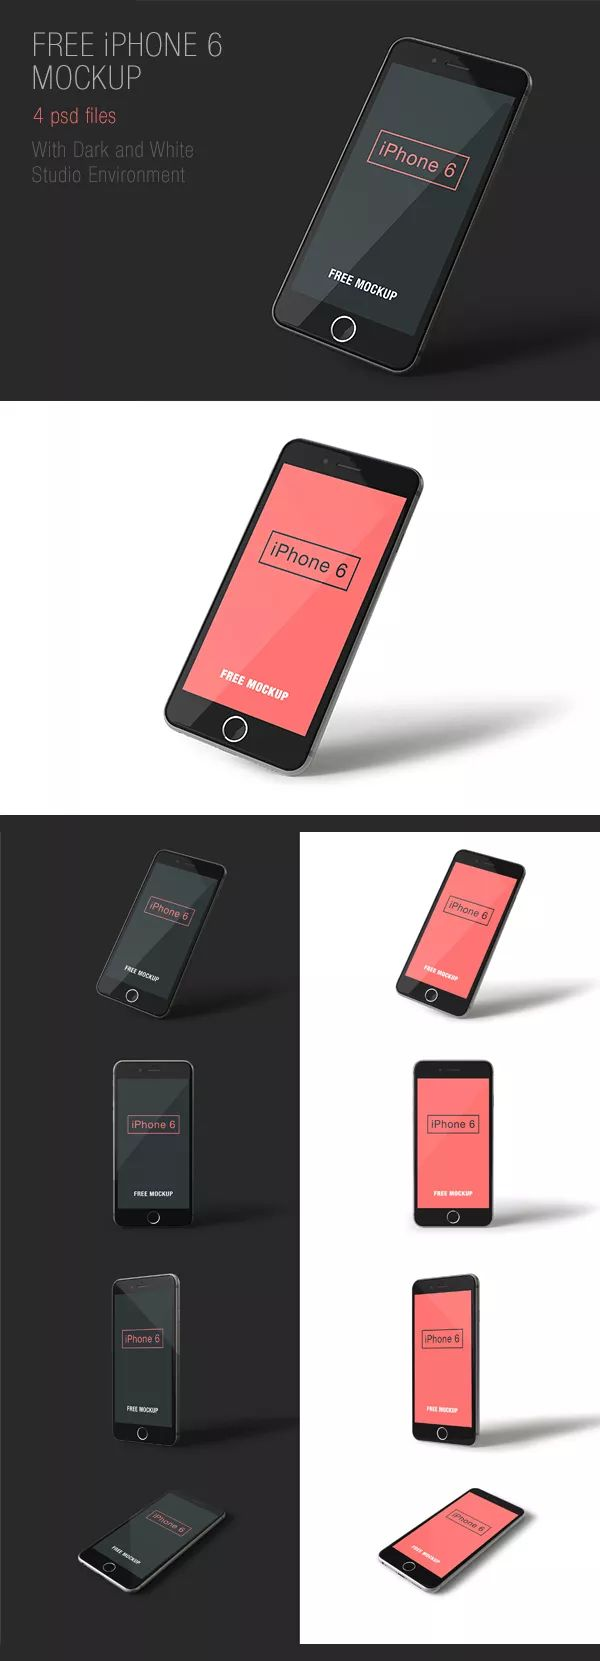 Free iPhone 6 psd Mockups #freebie #psd #mockup #free #design #graphic #resource…